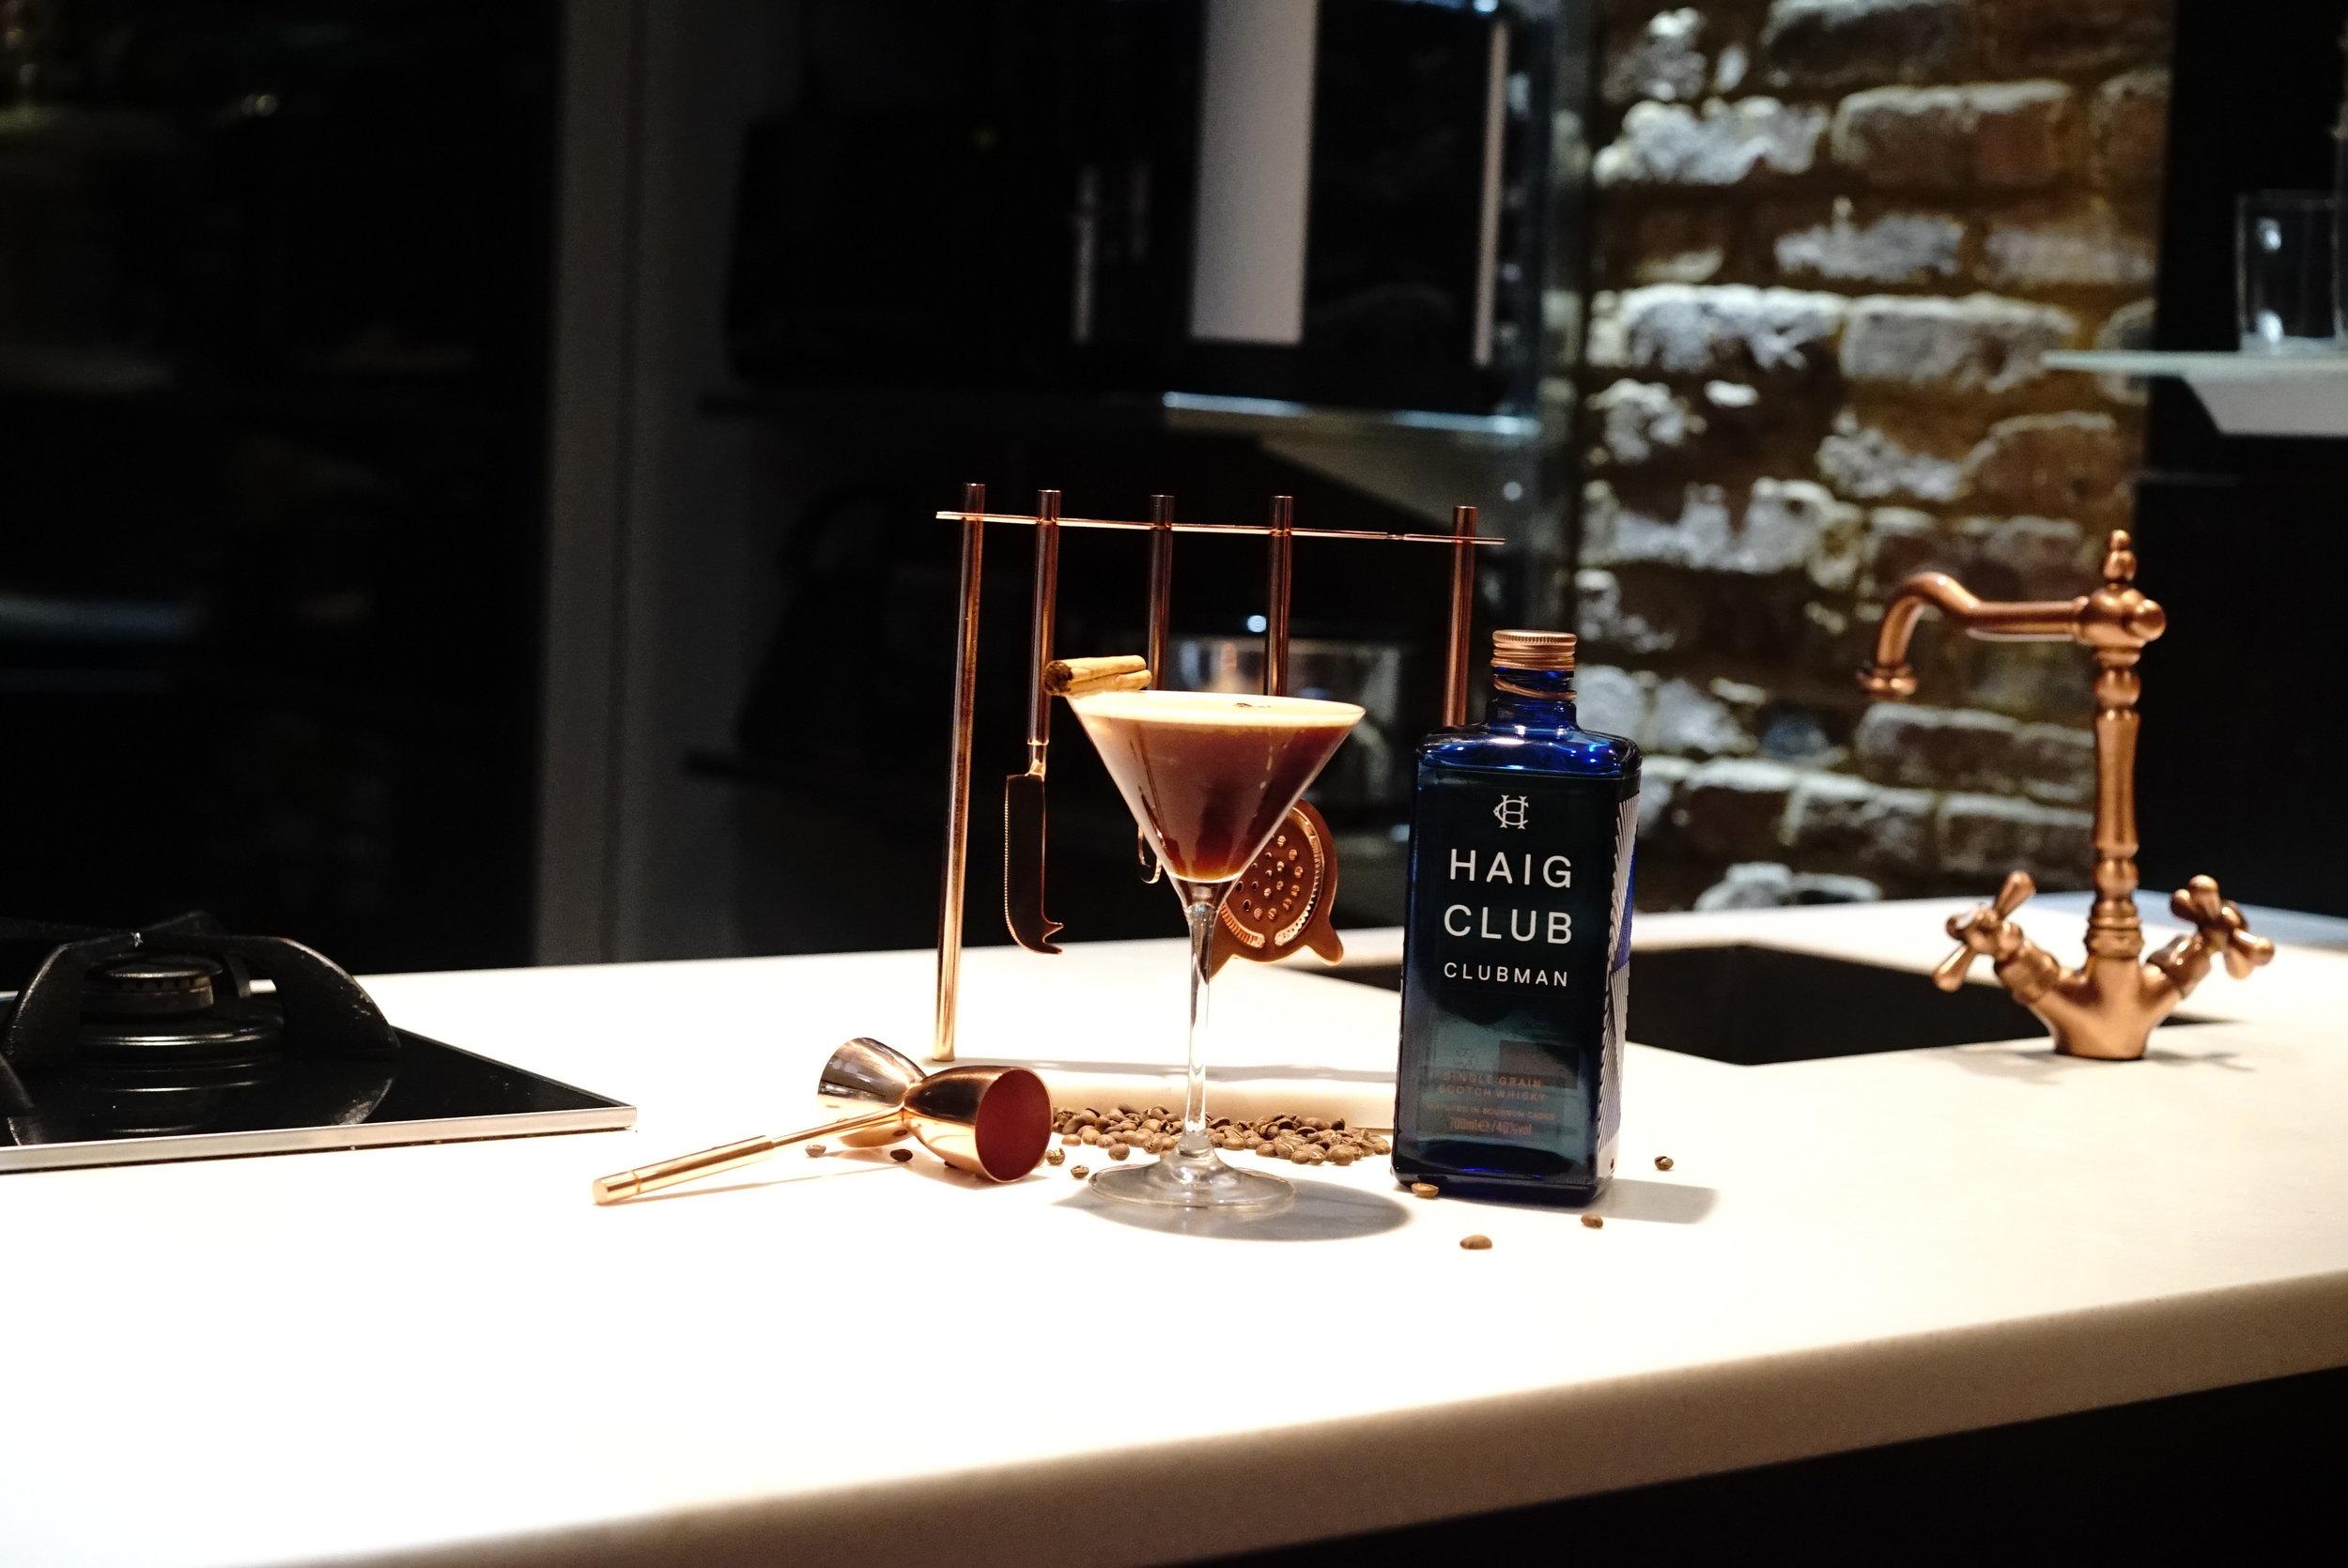 Haig Club Espresso Martini